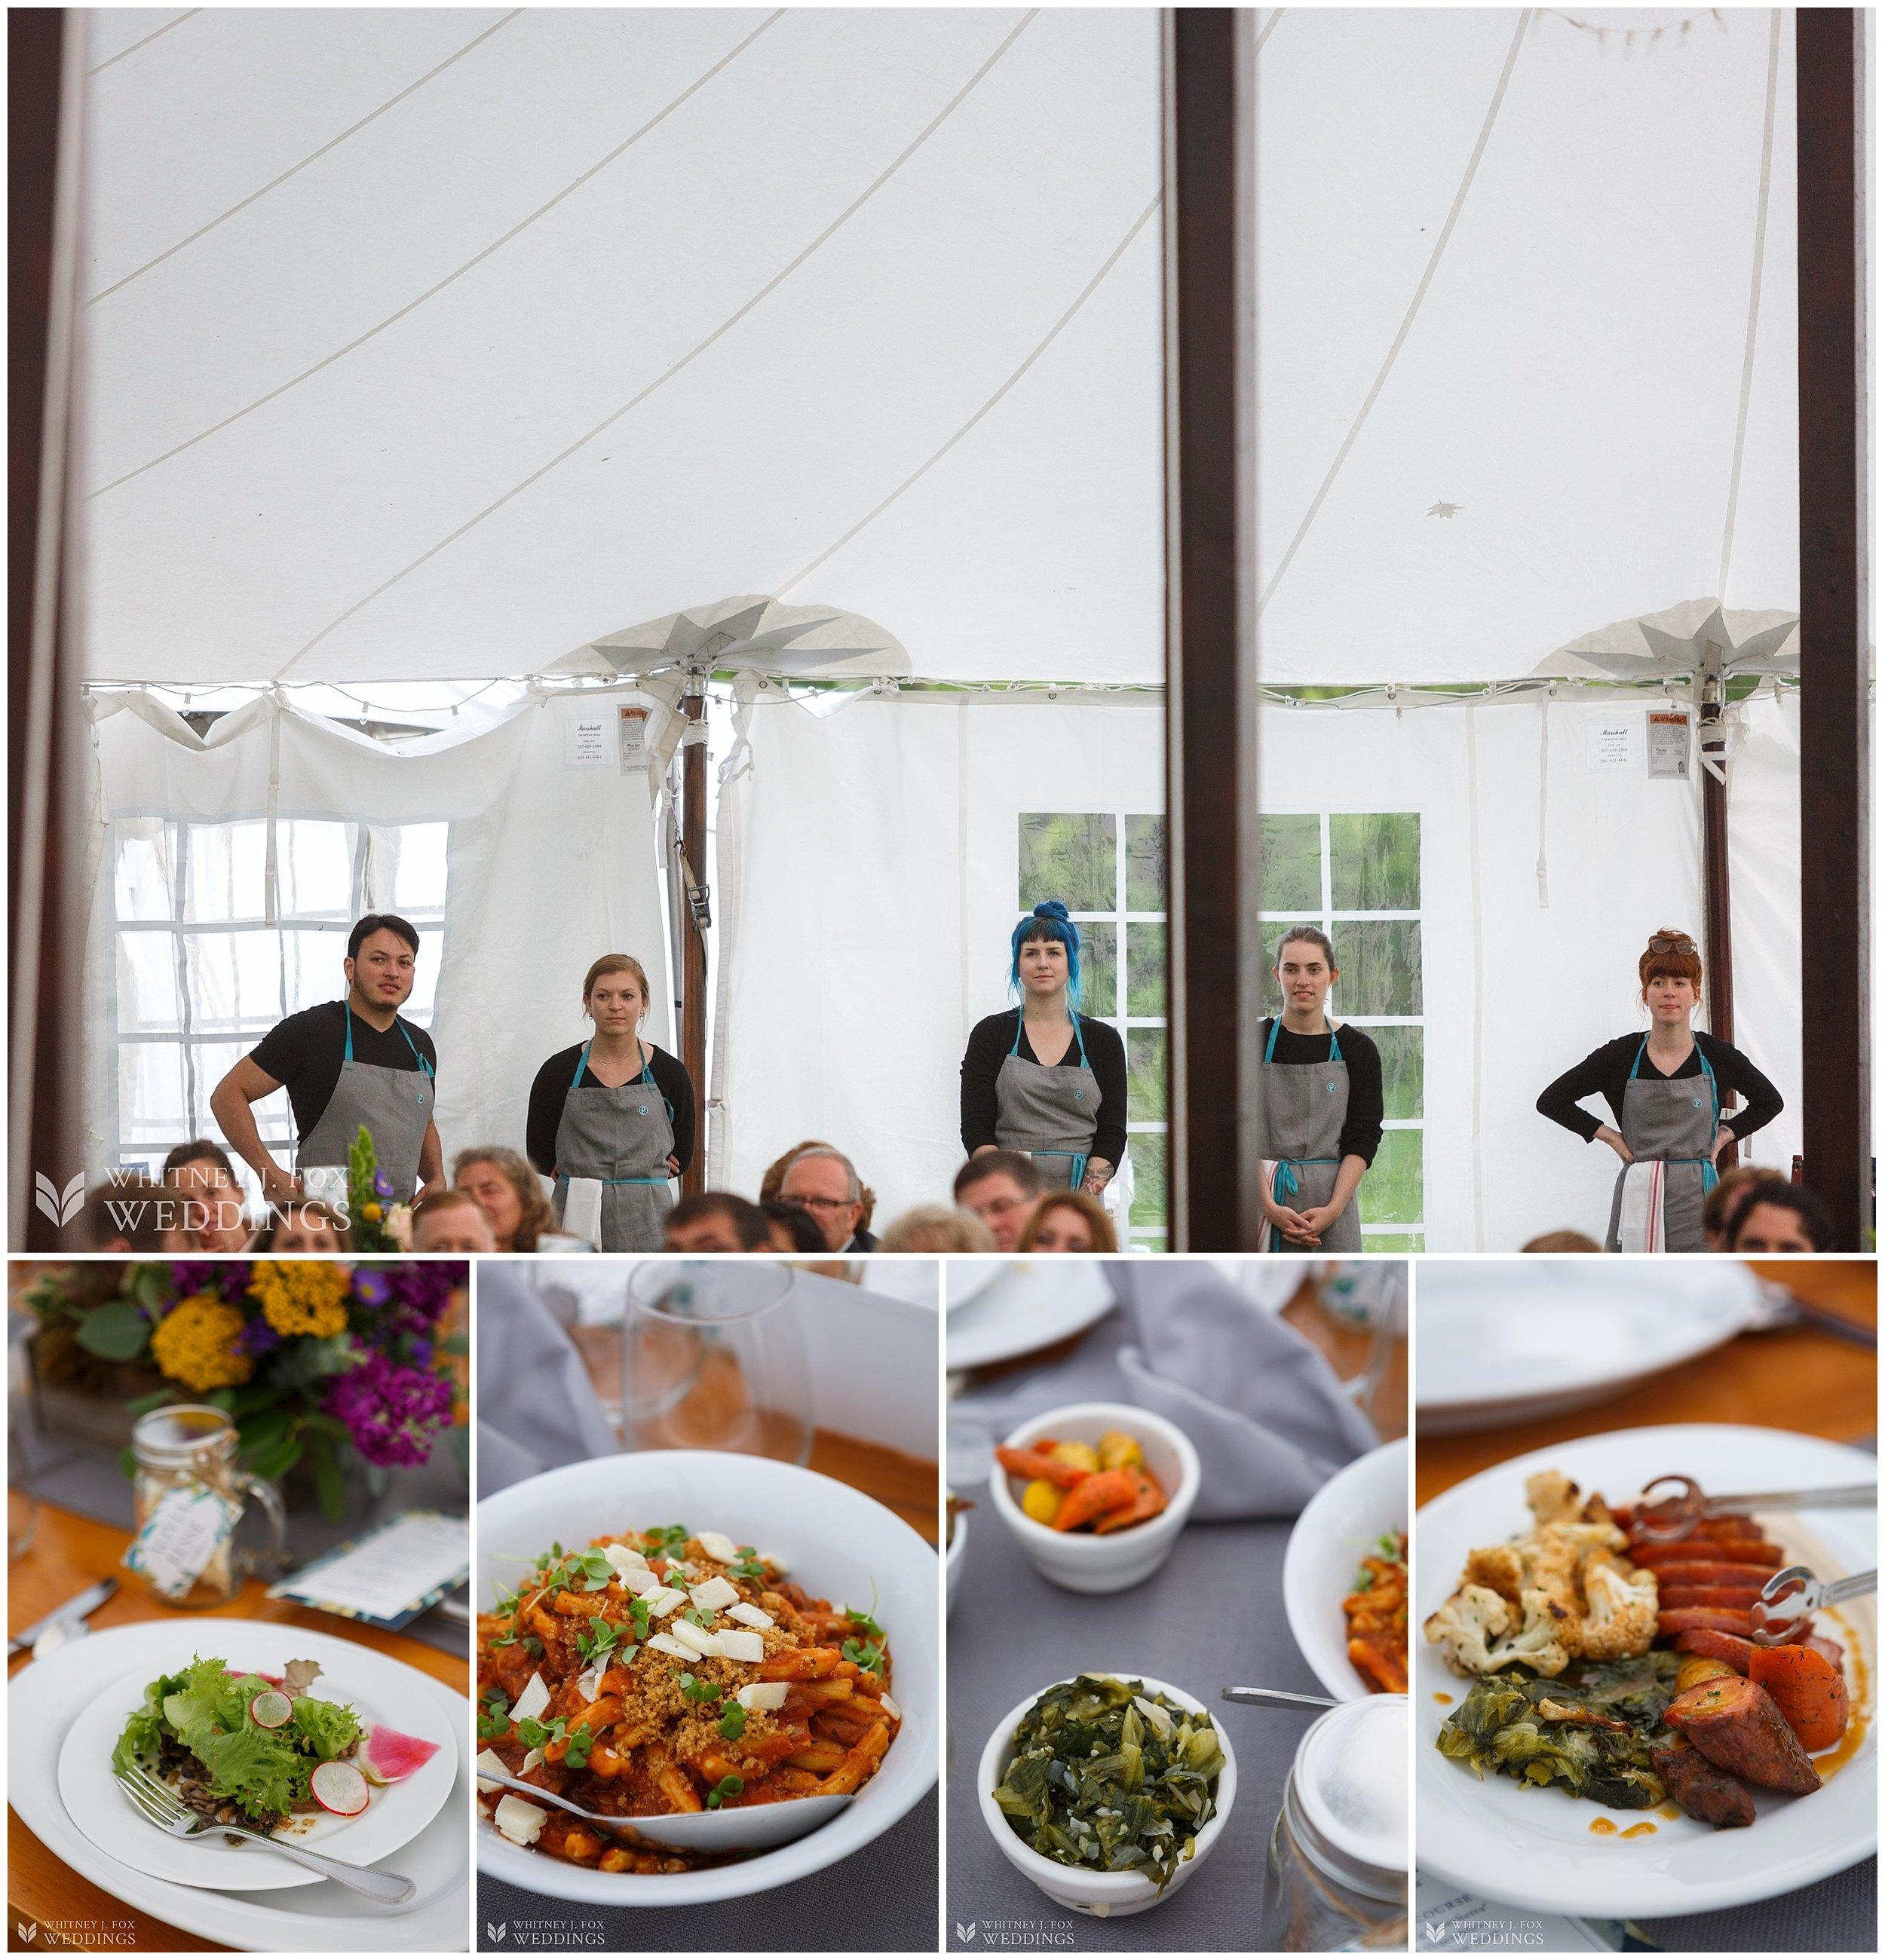 83_160_tai_josh_the_homestead_rest_be_thankful_farm_lyman_maine_photographer_whitney_j_fox_weddings_2053.jpg